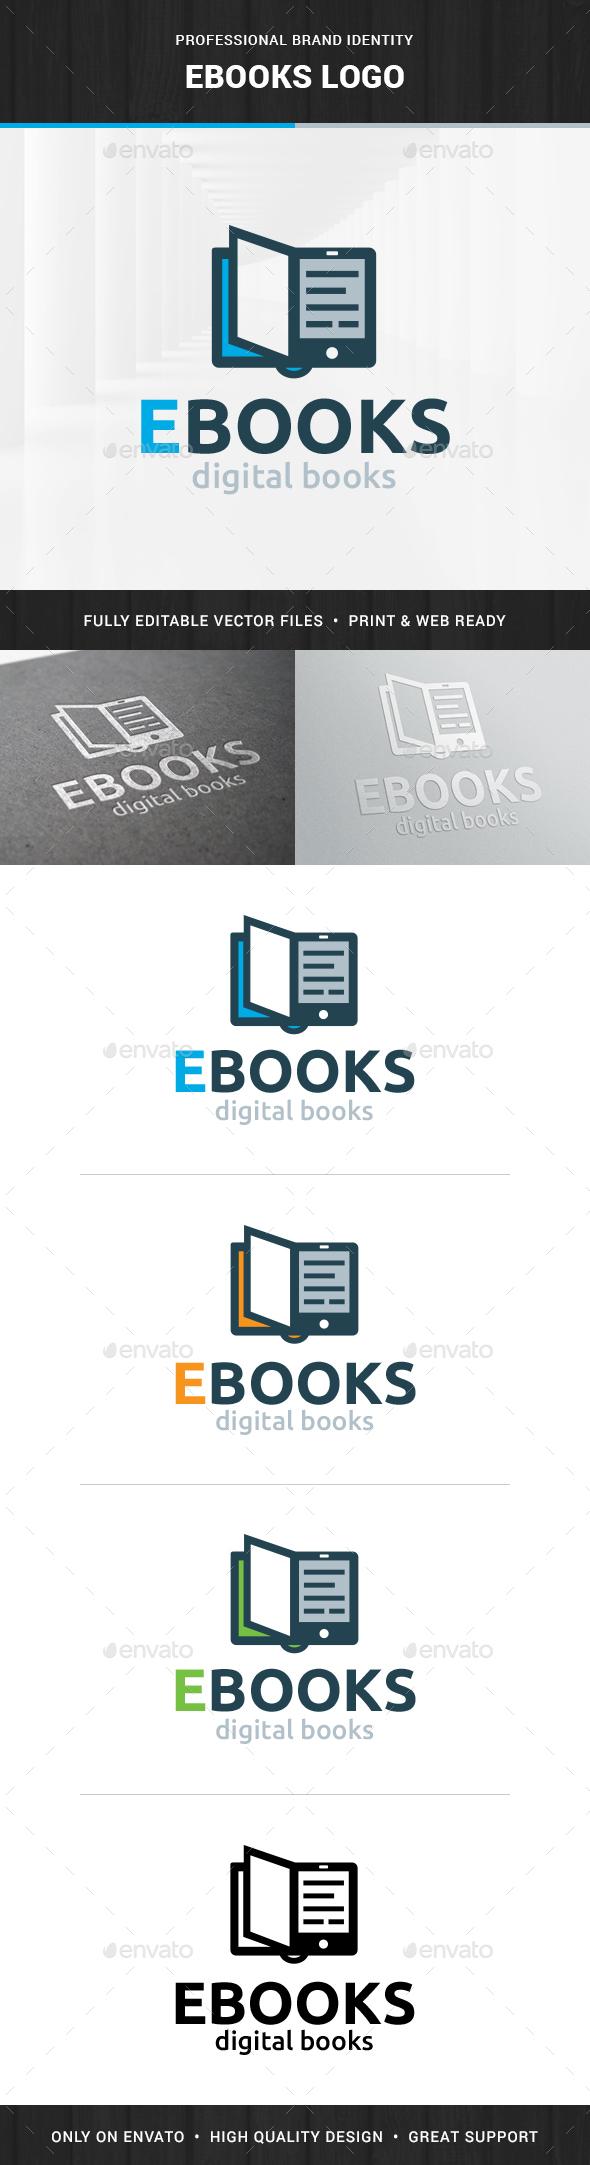 Ebooks Logo Template - Objects Logo Templates